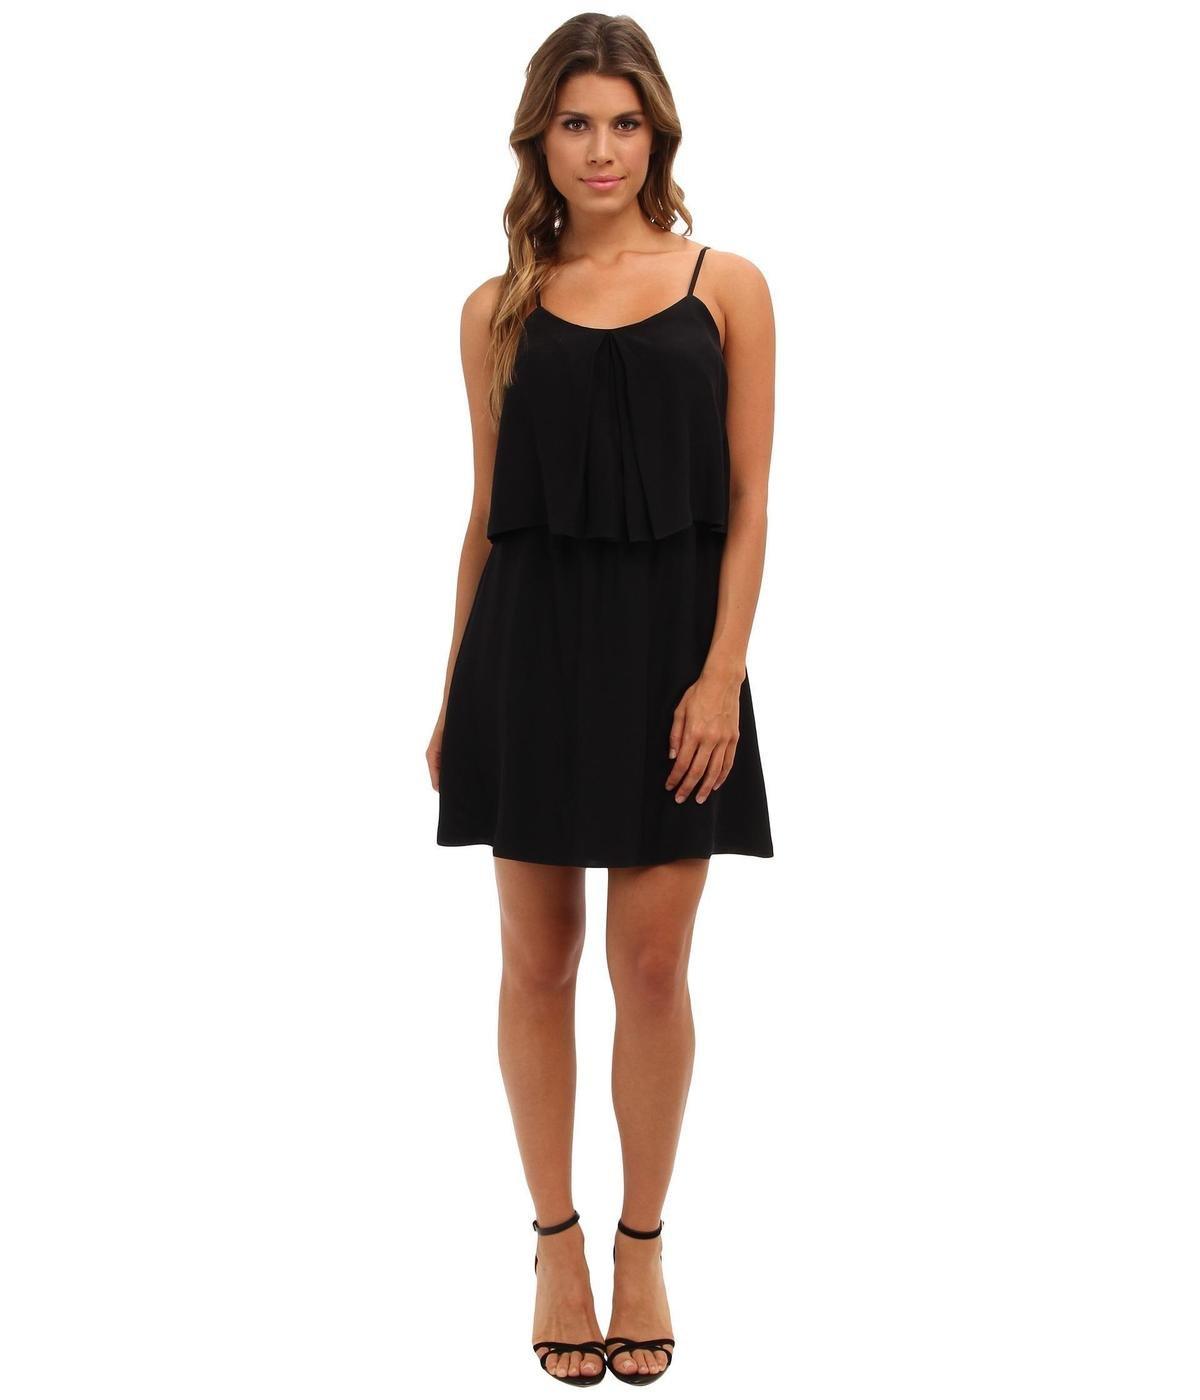 Summer Black Dresses ROJWWFmQ